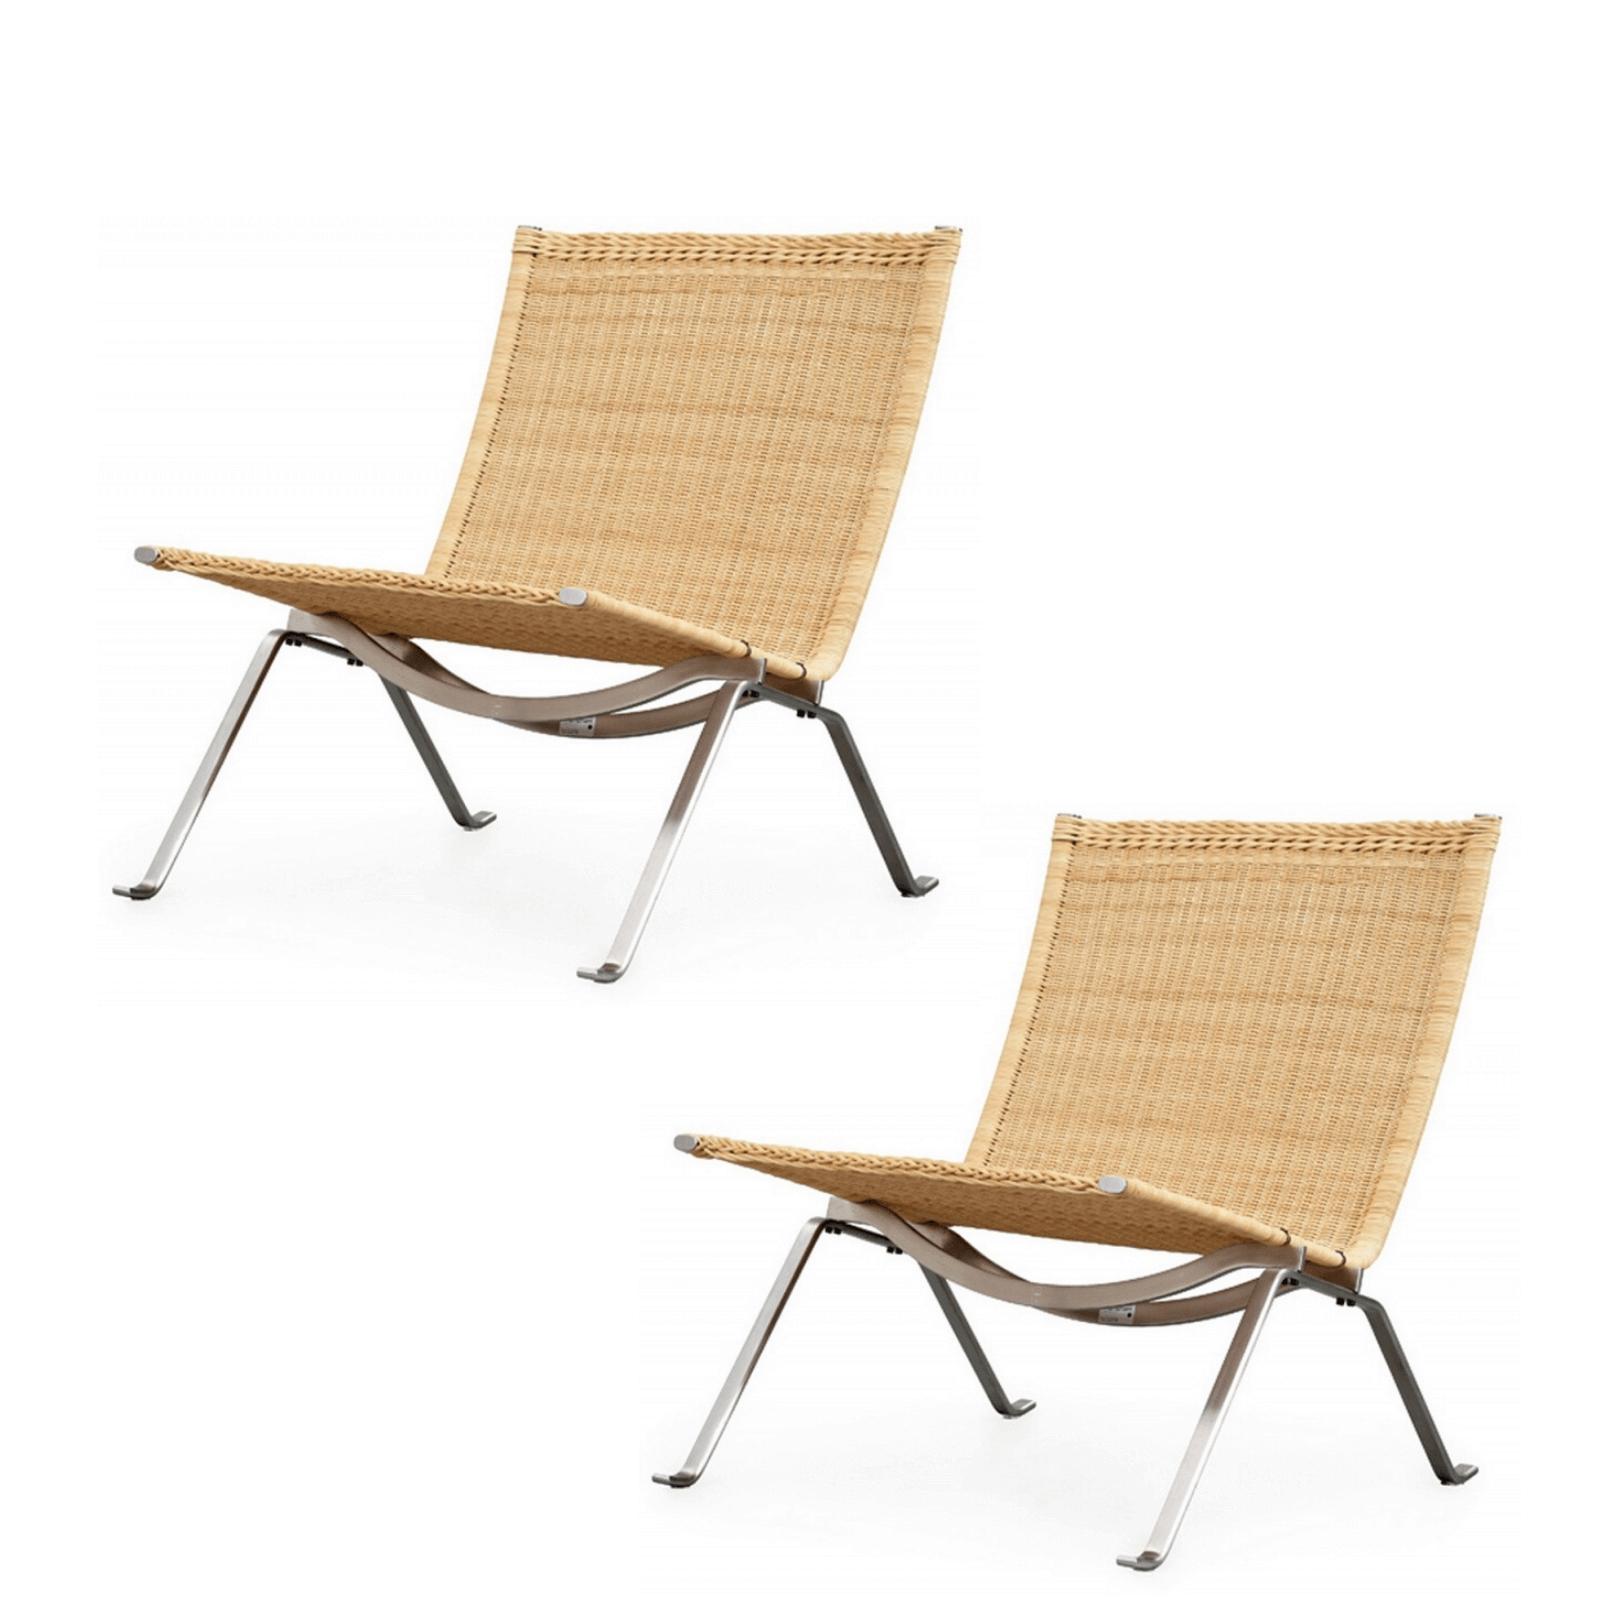 Fritz Hansen PK22 easy chairs pair